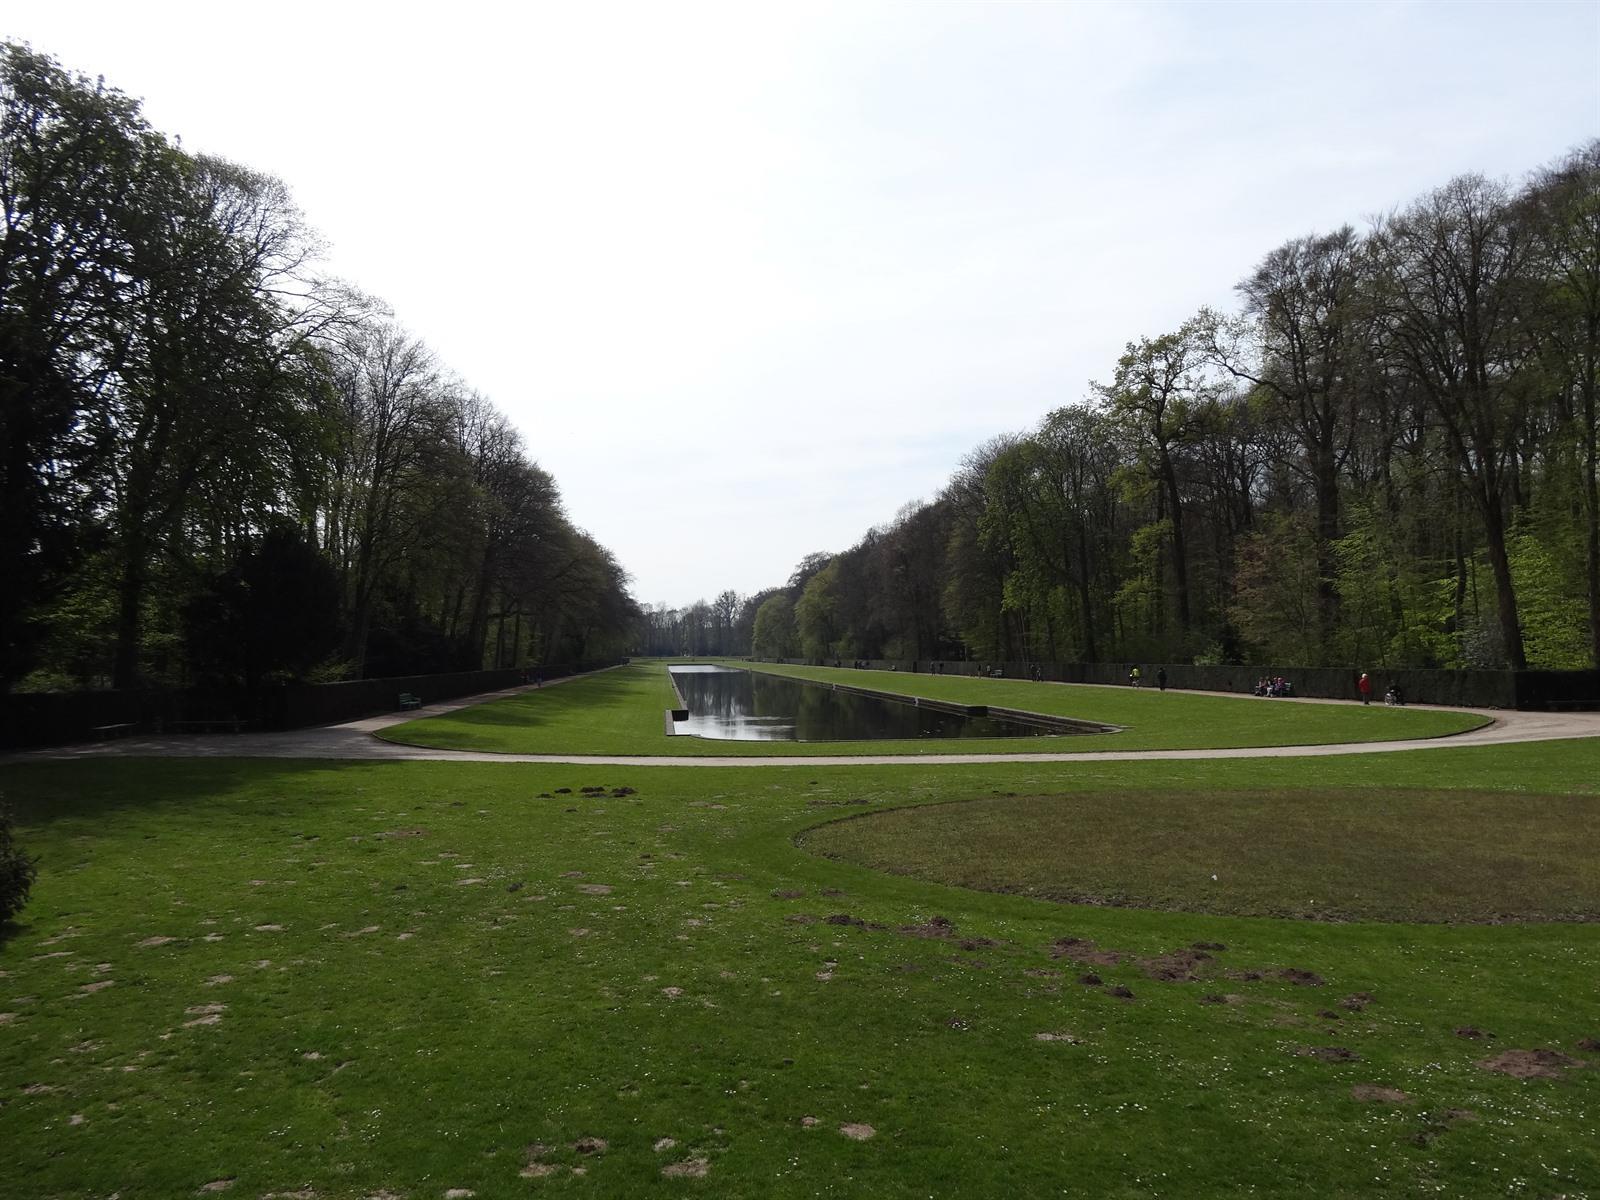 Schloss benrath dusseldorf 2287 2287 1 xl.jpg